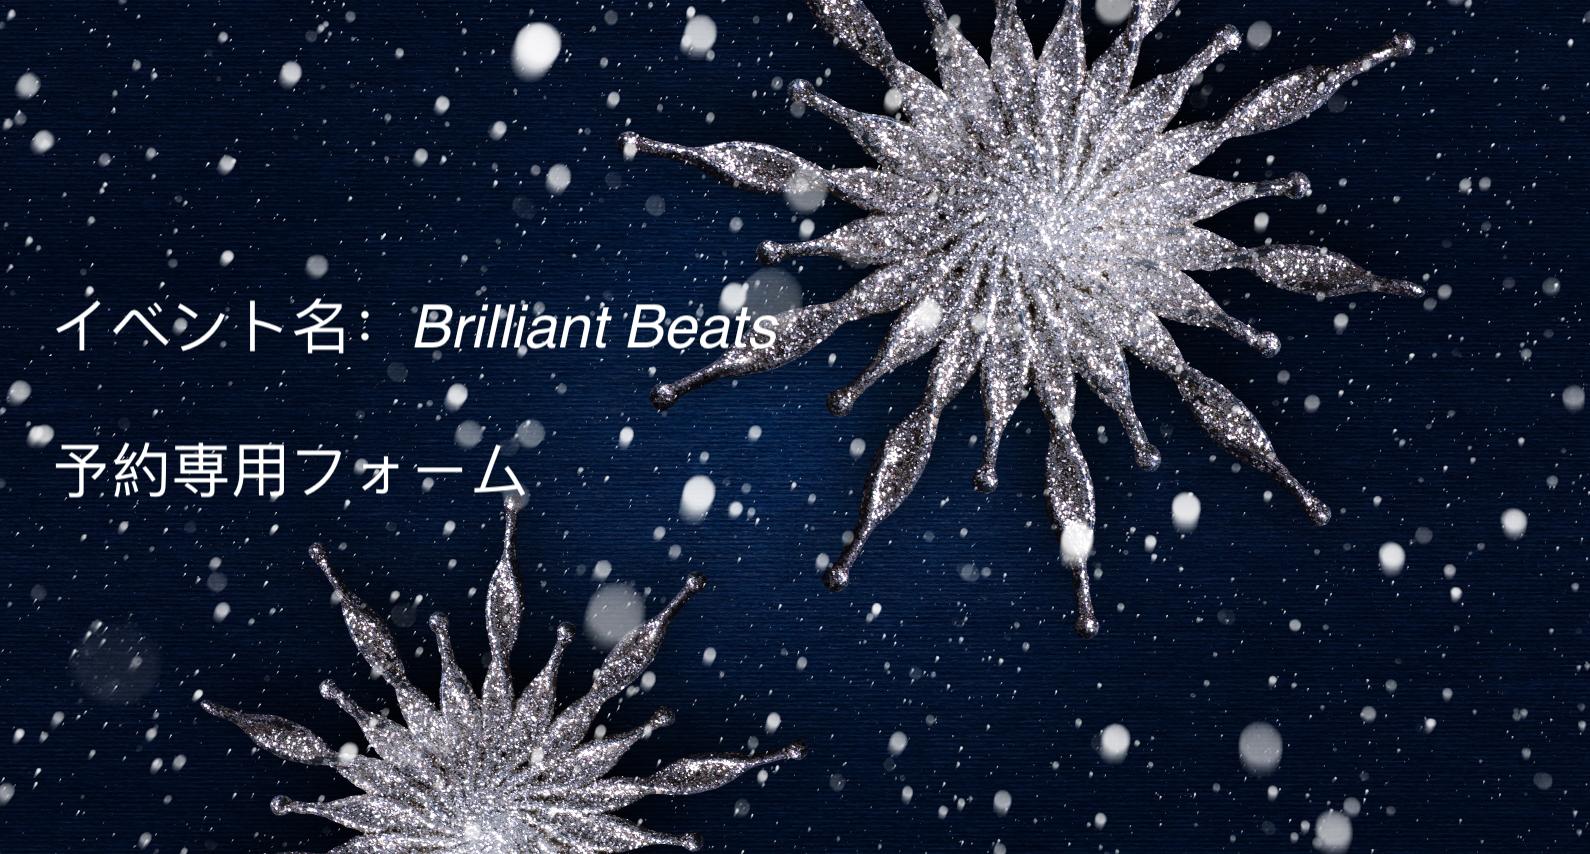 Brilliant Beats - クリスマスチャリティーコンサート